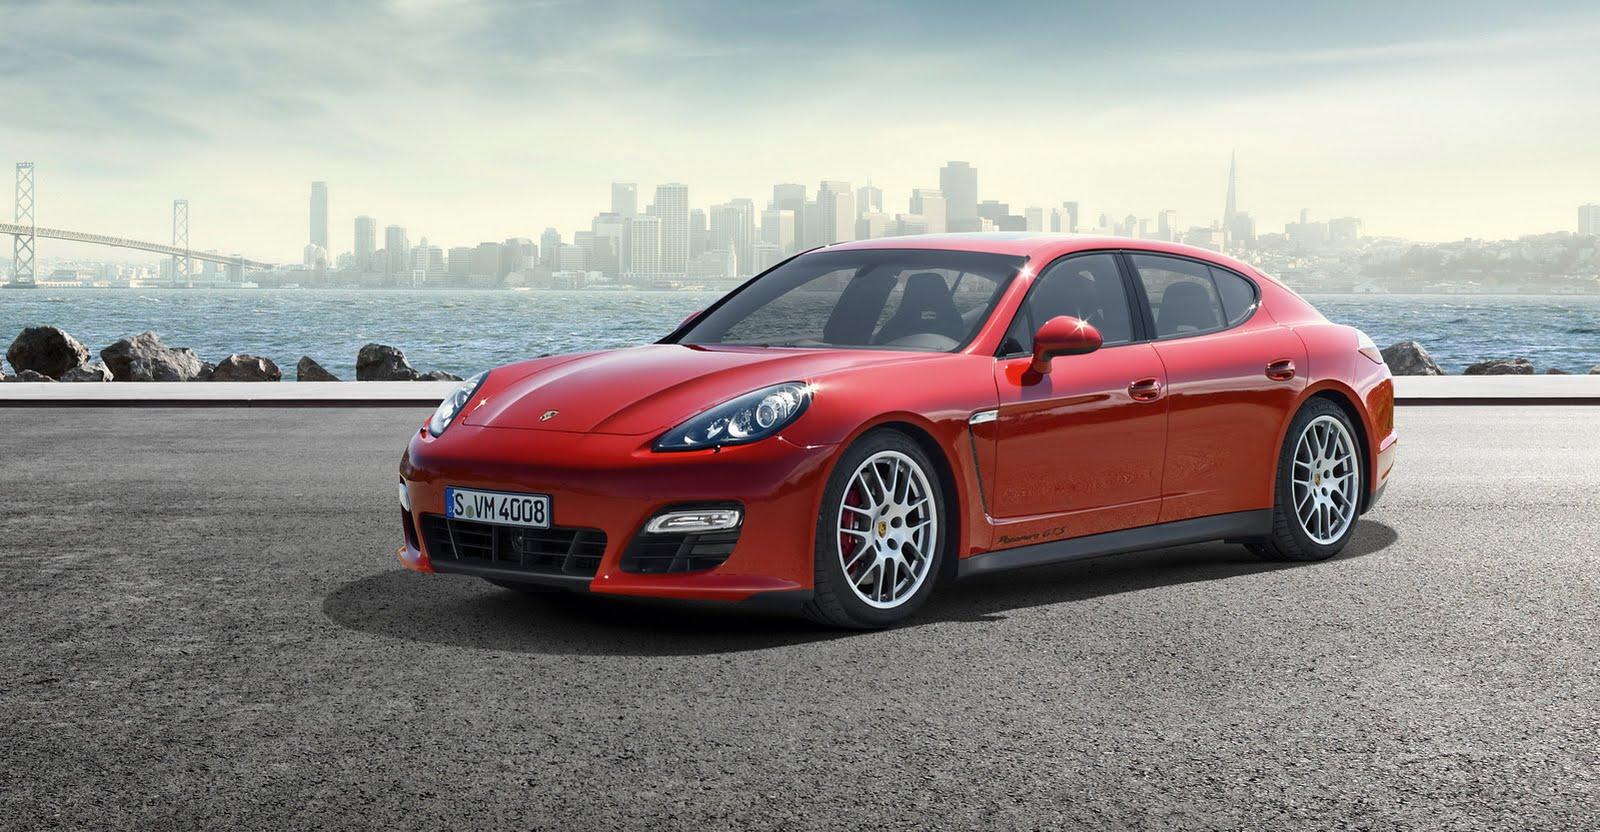 2011 La Auto Show Porsche Panamera Gts World Debut